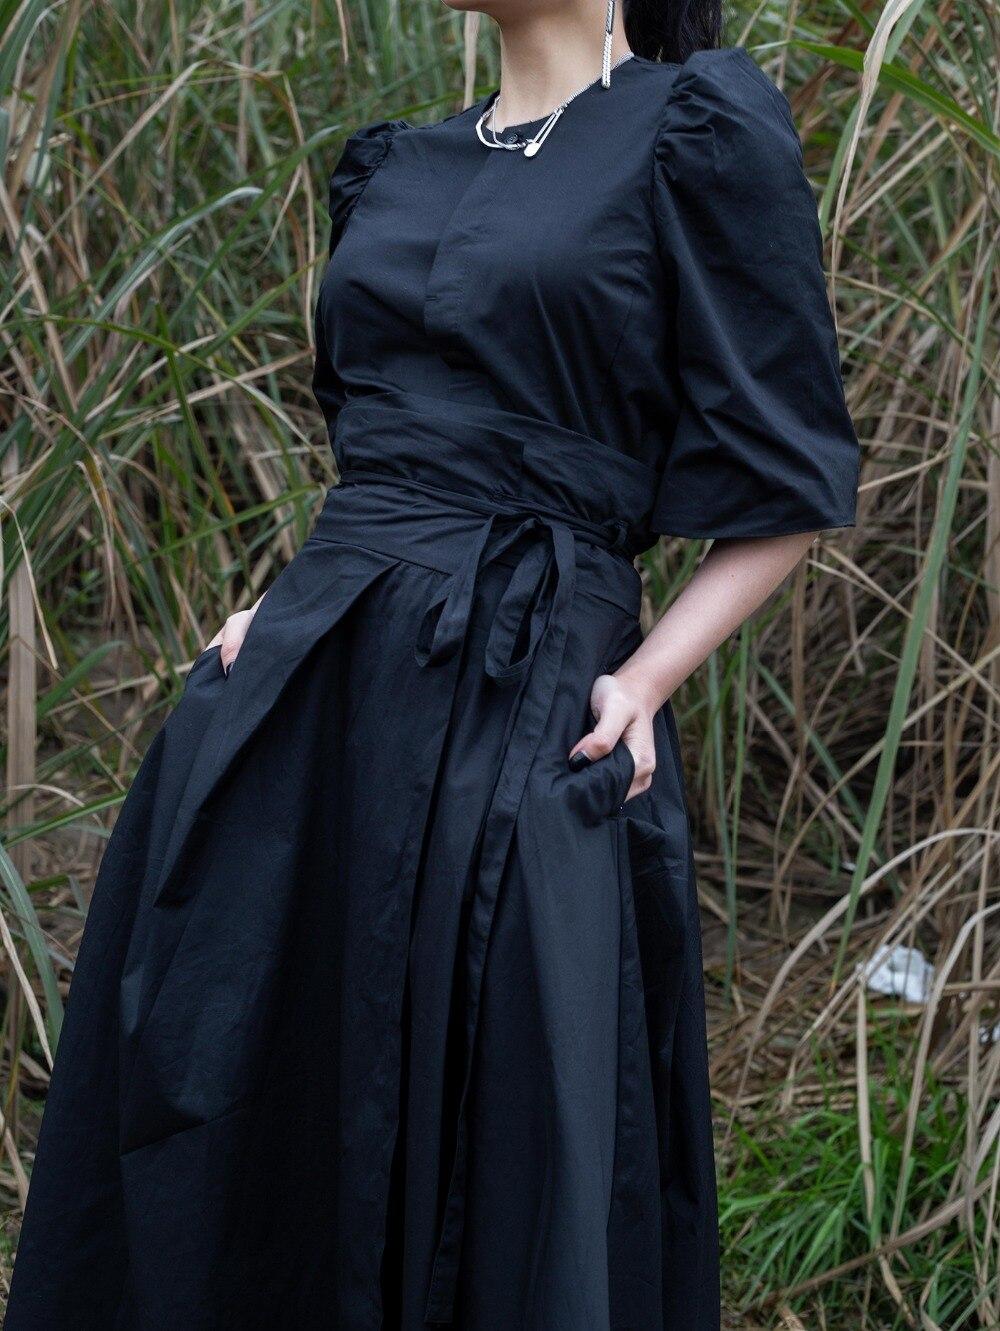 Cakucool 새 여성 일본식 스커트 가을 비대칭 디자이너 블랙 스트라이프 찢어진 가장자리 streetwear 미디 스커트 여성용-에서스커트부터 여성 의류 의  그룹 3